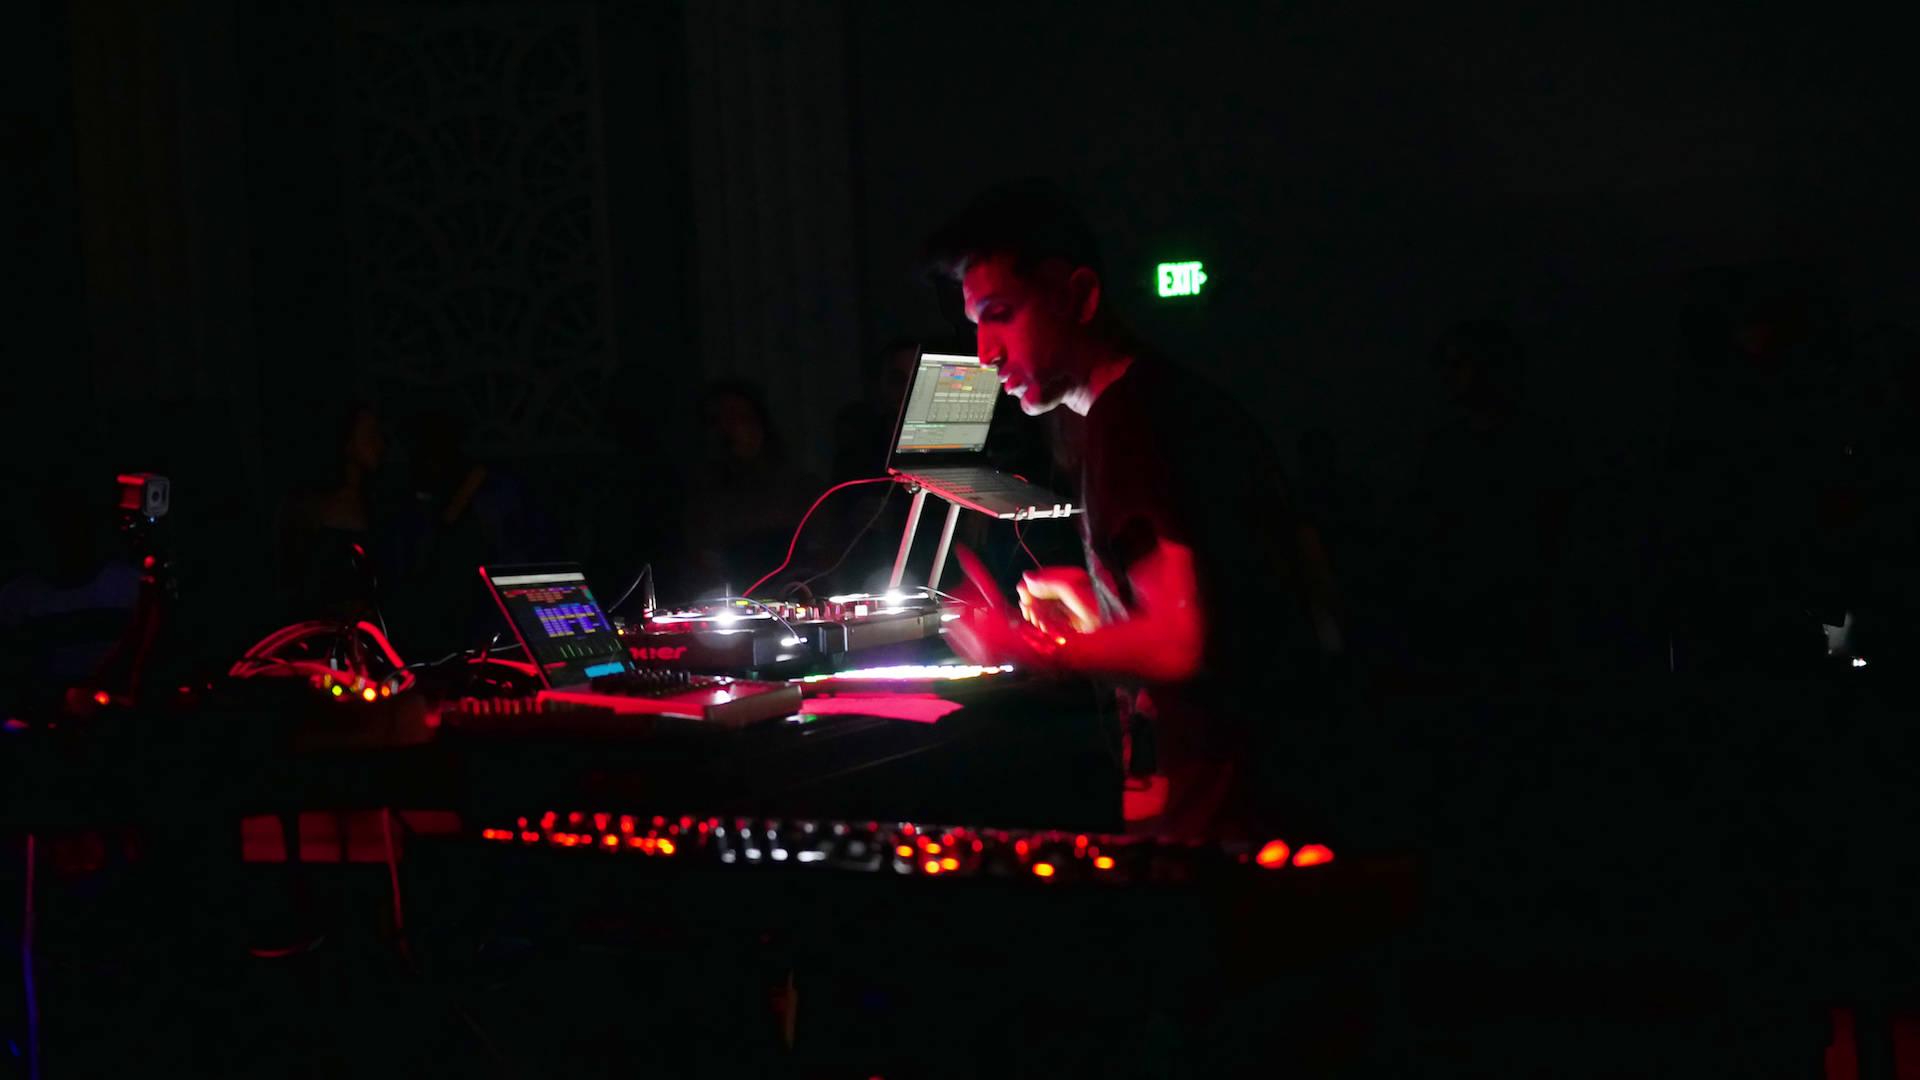 Kush Arora makes industrial techno and kuduro under the monicker Only Now.  Jef Stott